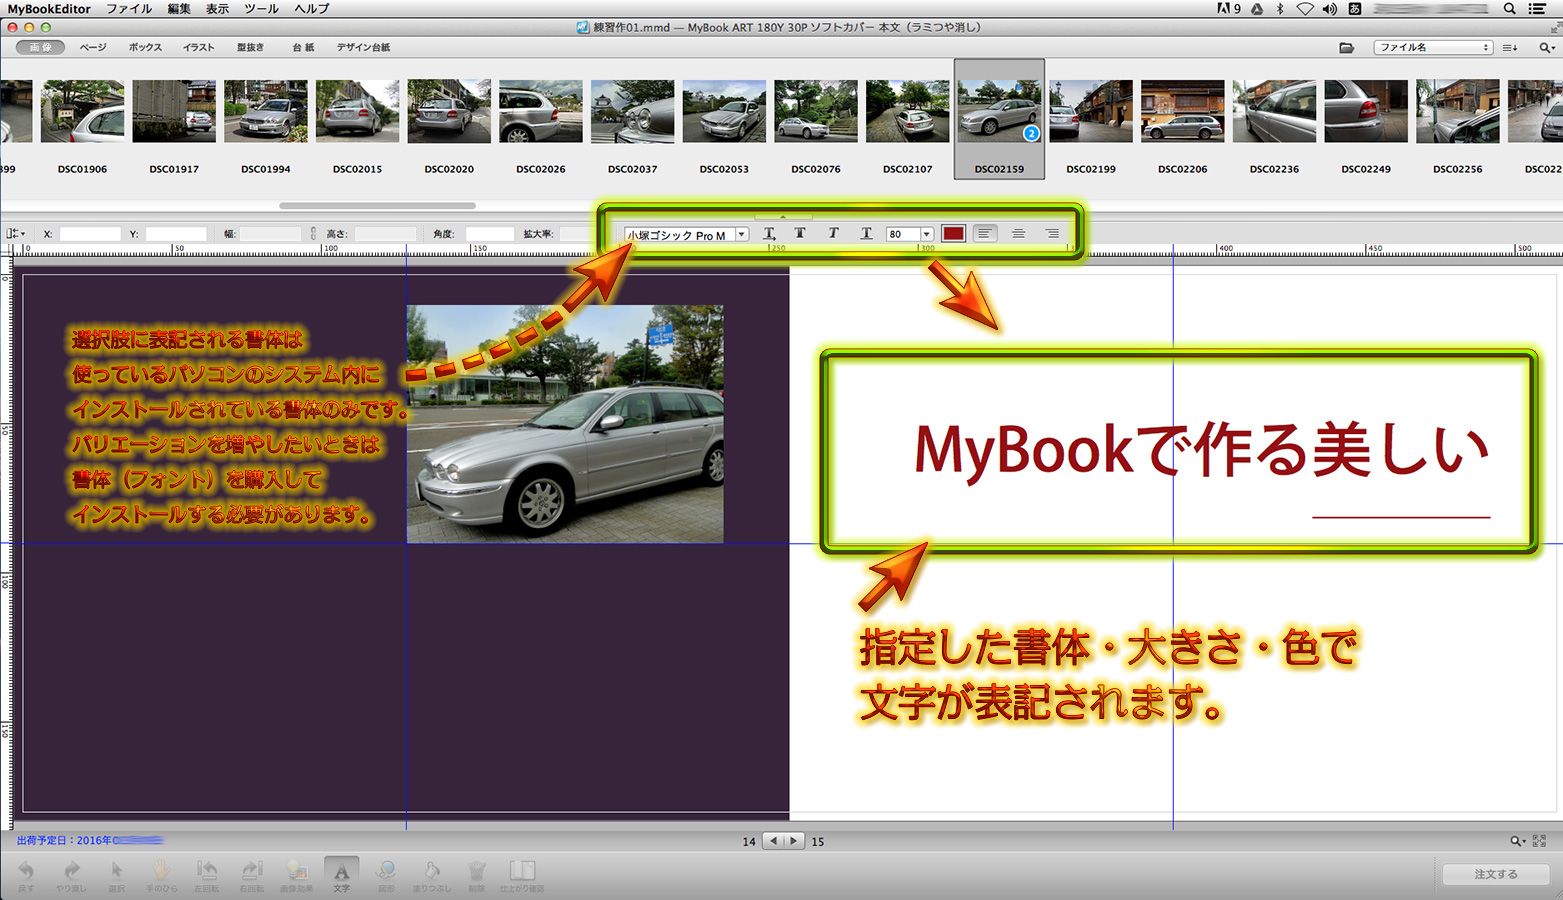 http://moritetsu.info/car/img/mb061-2016-03-02-18-47-31.jpg